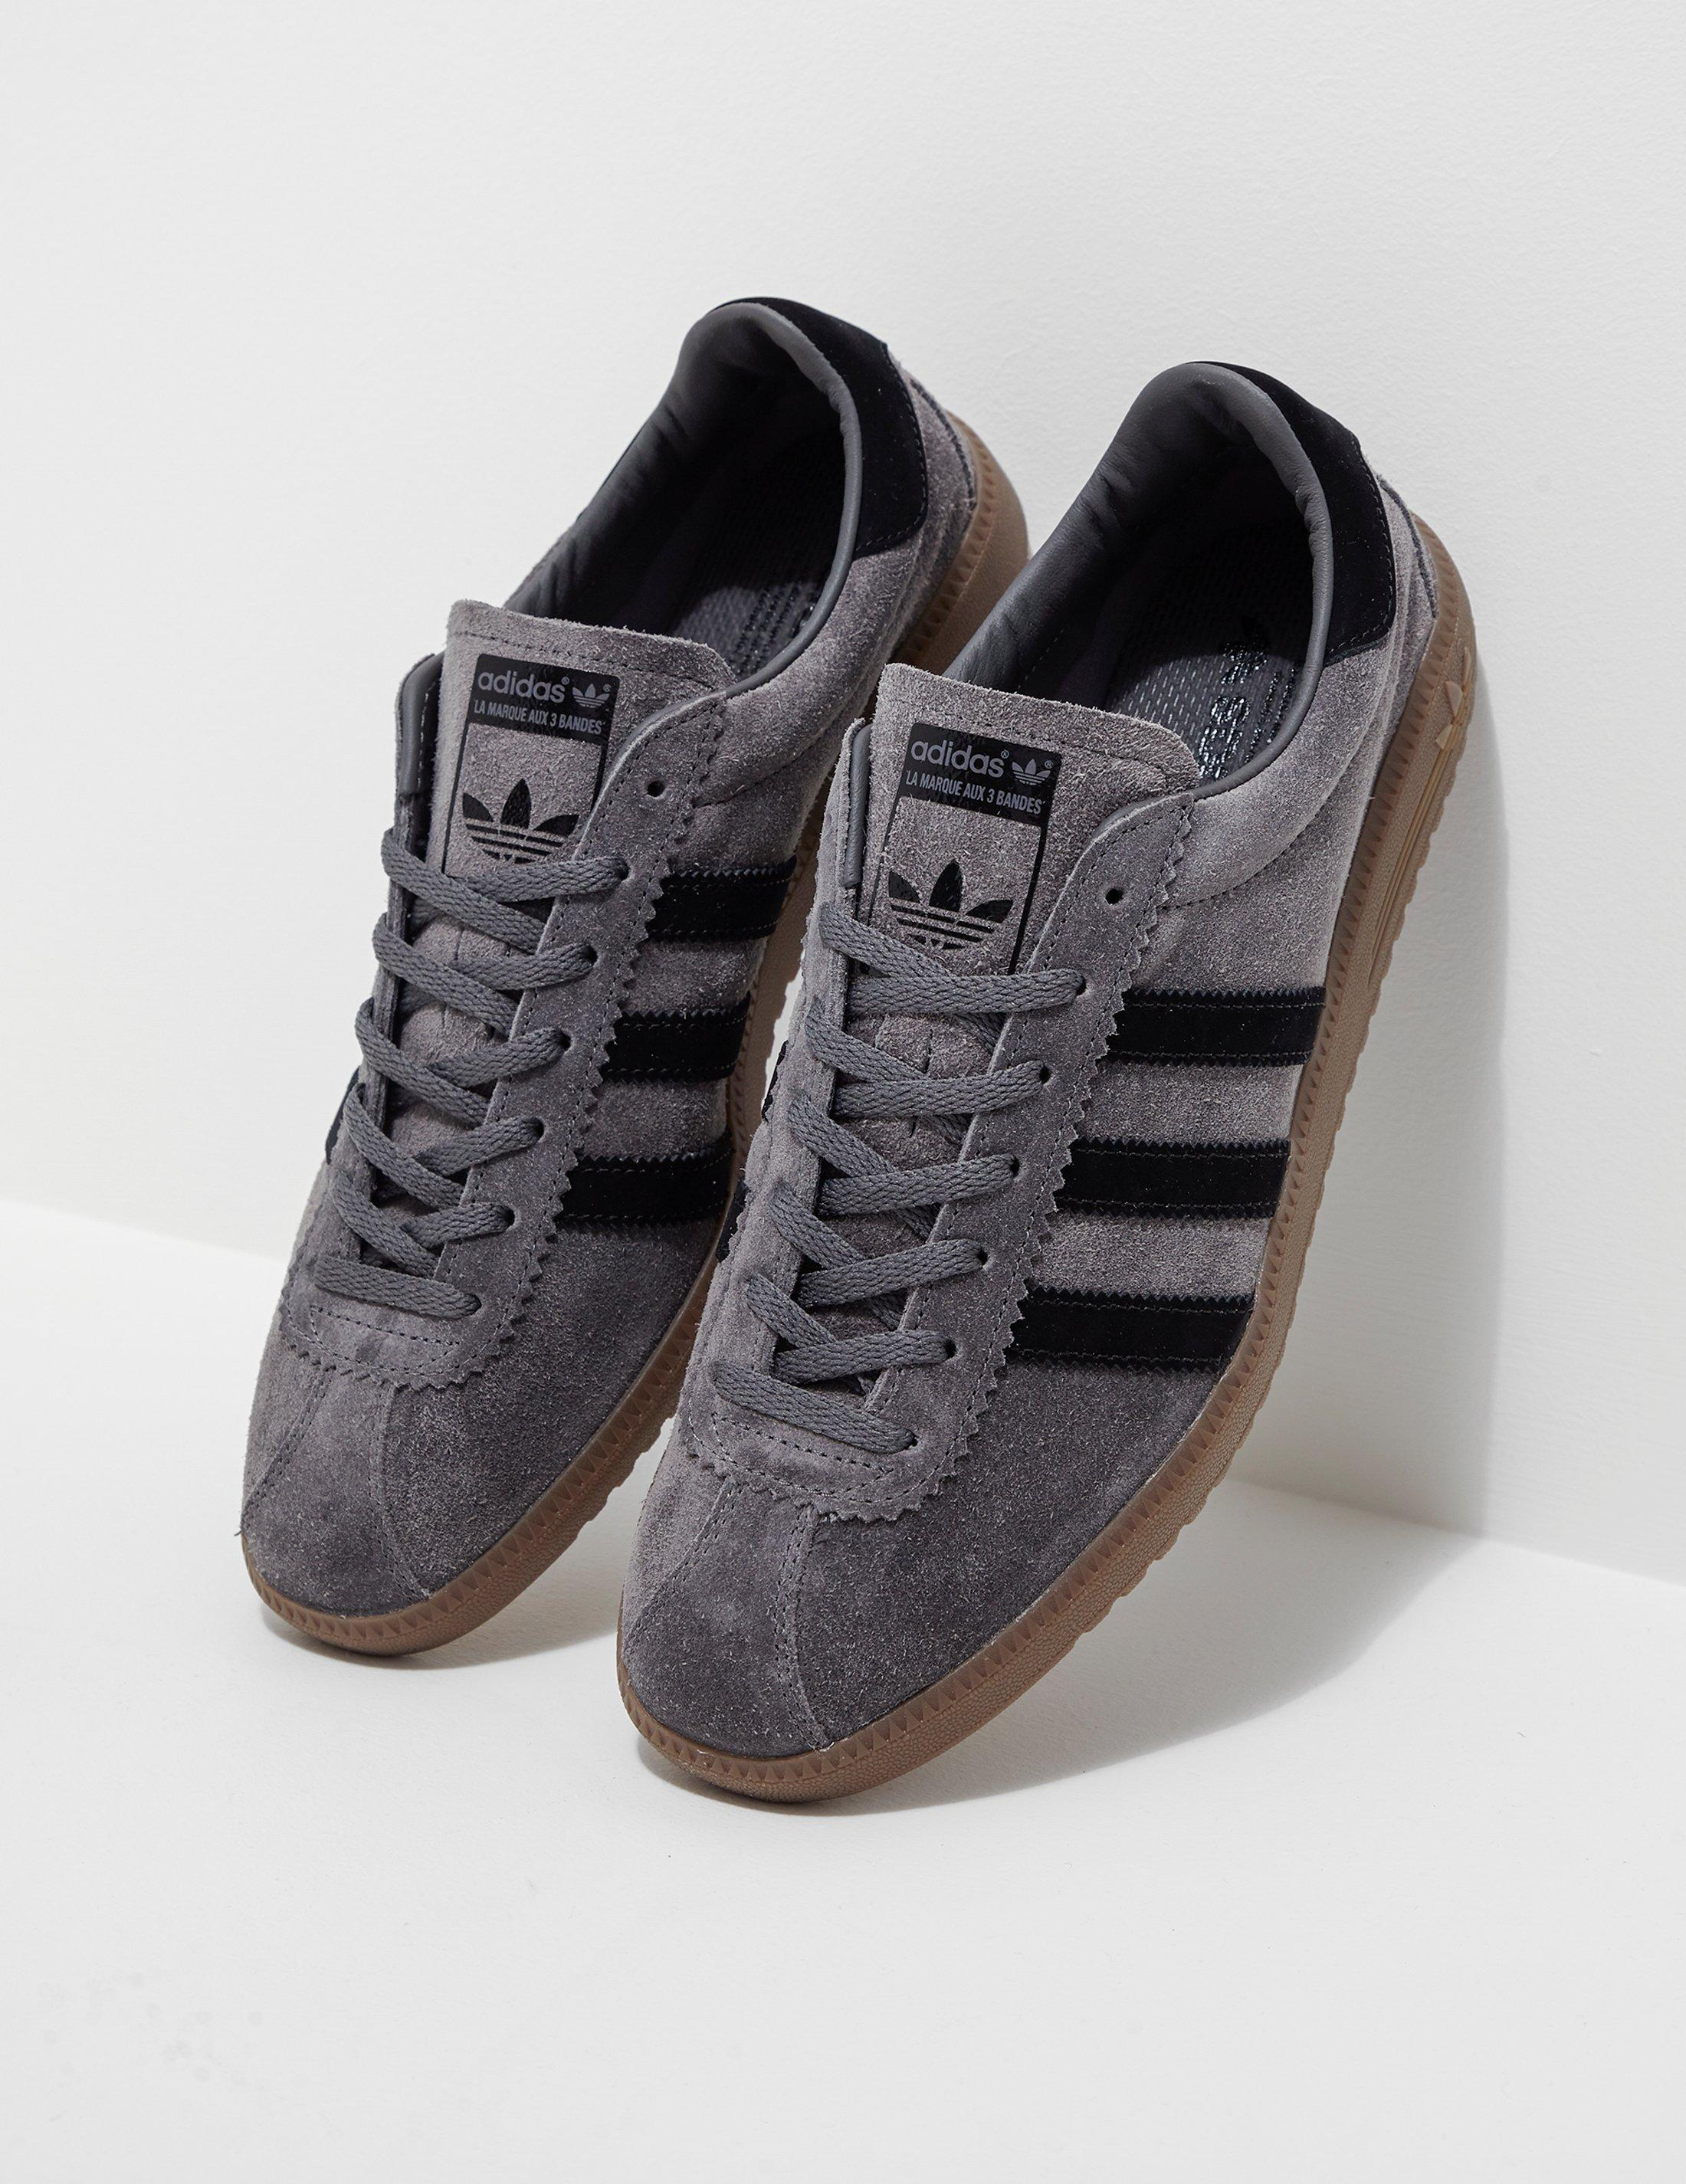 Lyst - adidas Originals Mens Bermuda Grey black in Gray for Men 3b33240af